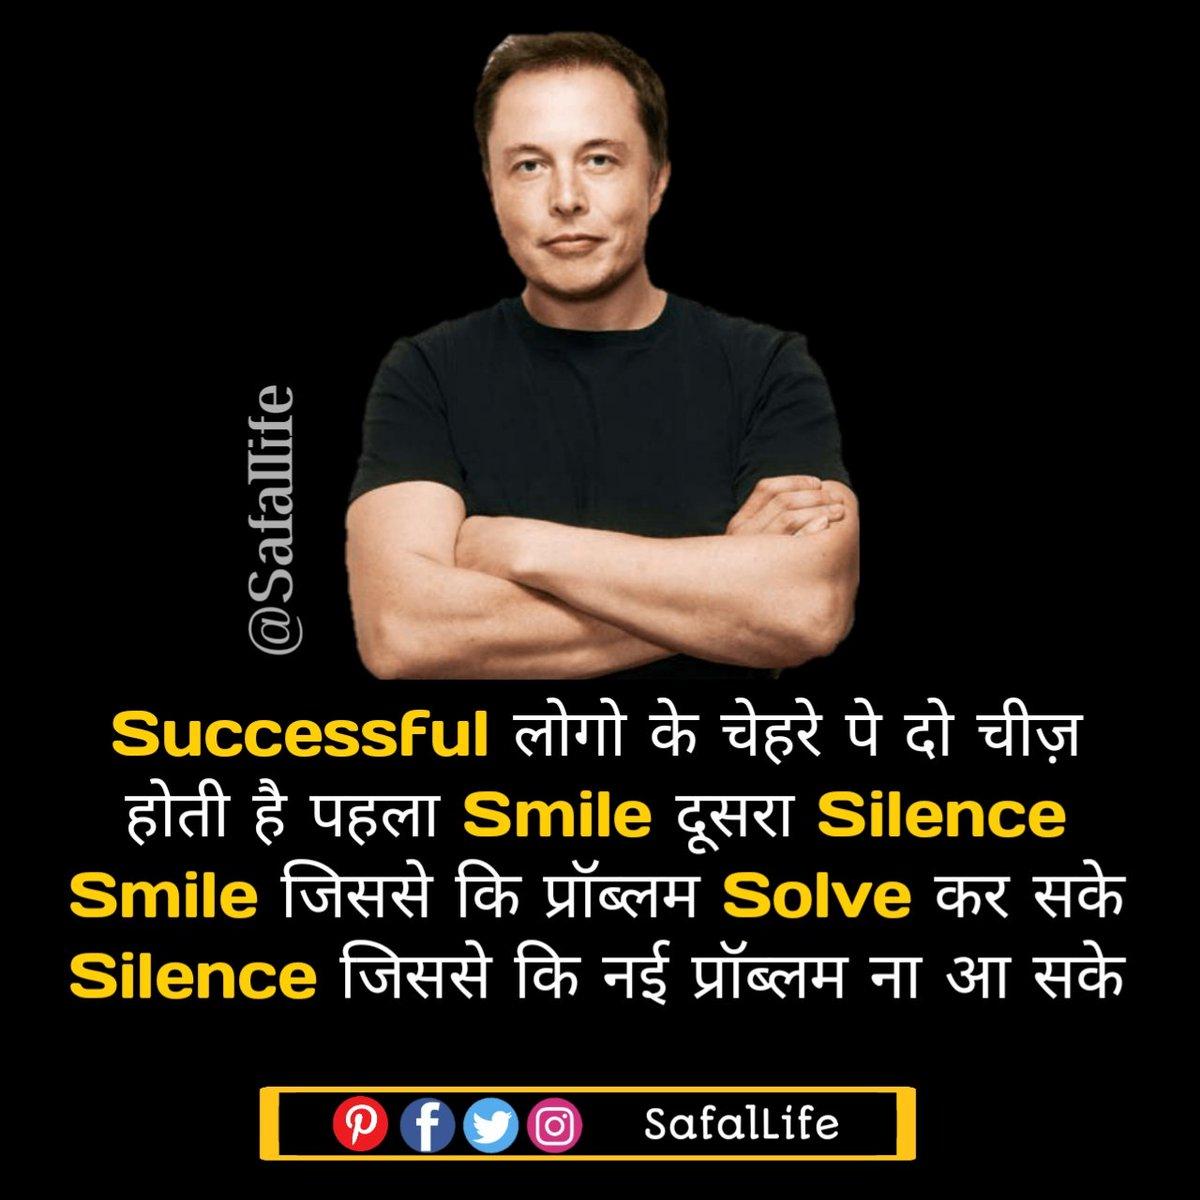 Successful लोगो के चेहरे पे दो चीज़ होती है पहला Smile और Silence Smile जिससे कि प्रॉब्लम Solve कर सको Silence जिससे कि नई प्रॉब्लम न आ सके  #safallife #motivationhindi #bussinessmind #SundayMotivationpic.twitter.com/QPu7zzNdqk